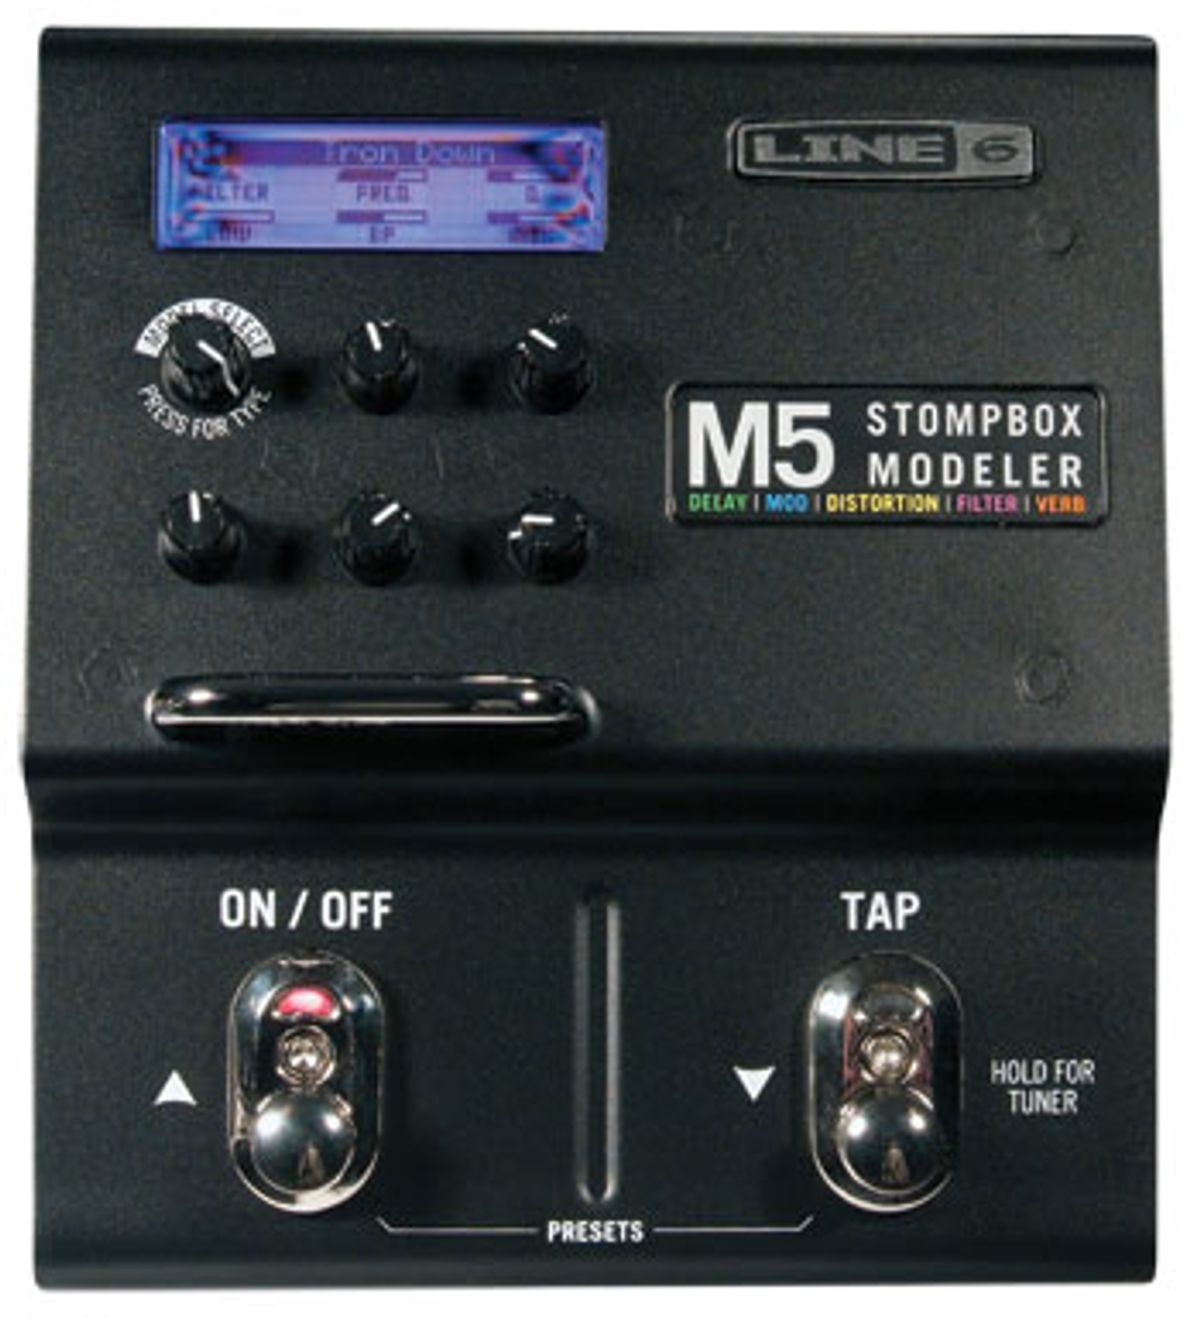 Line 6 M5 Stompbox Modeler Review